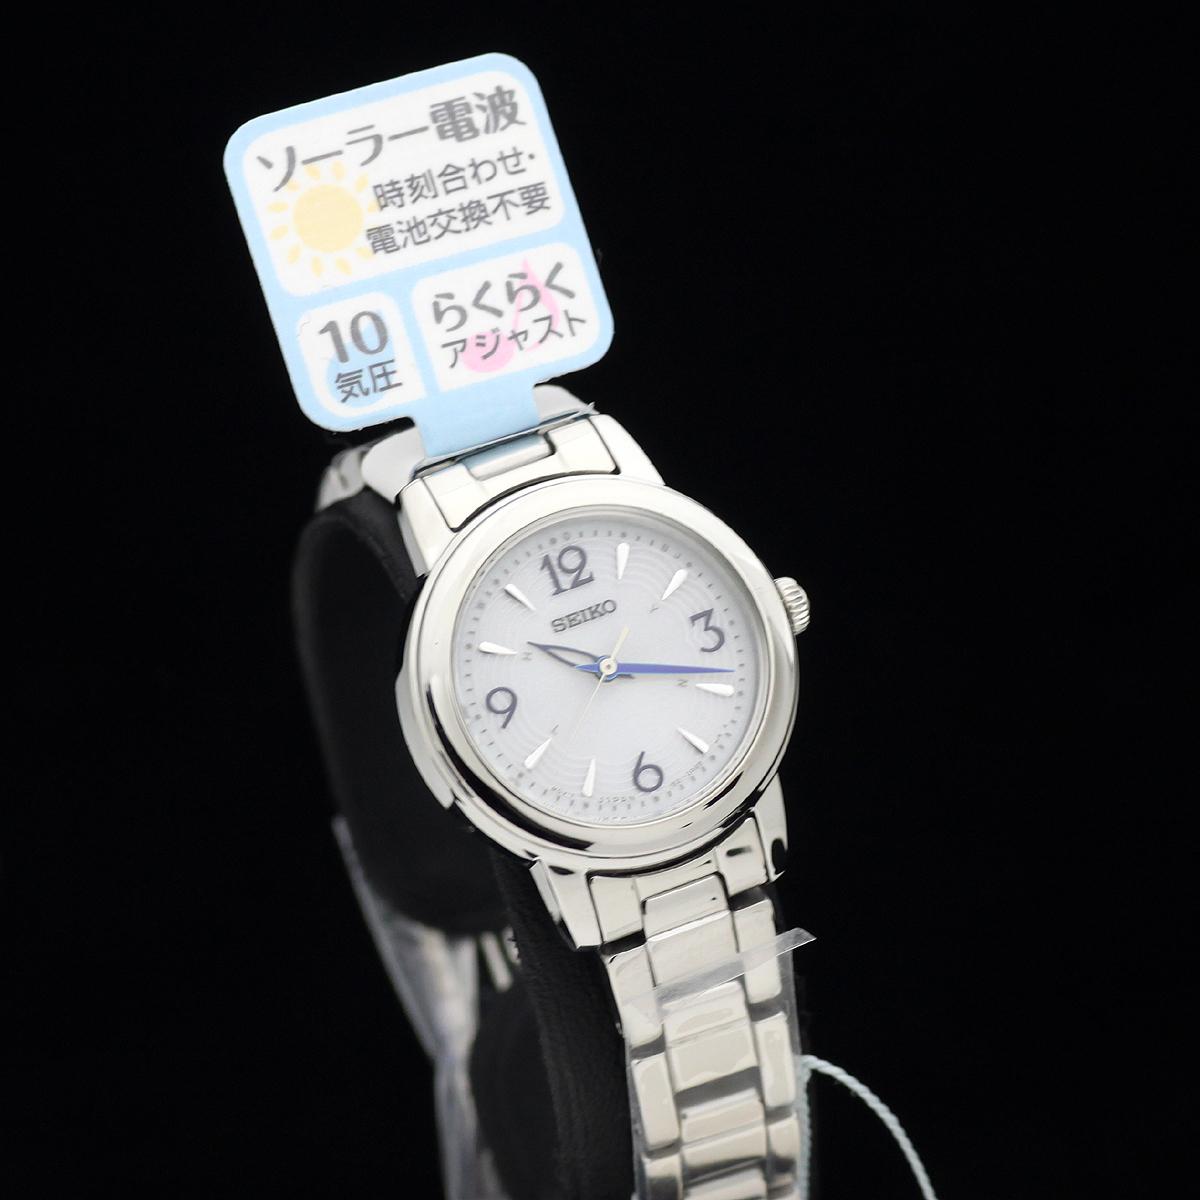 1eeda7fbe9 代購代標第一品牌 - 樂淘letao - 未使用品 SEIKO セイコー ティセ TISSE SWFH015 1B21 電波ソーラー SS 箱工具